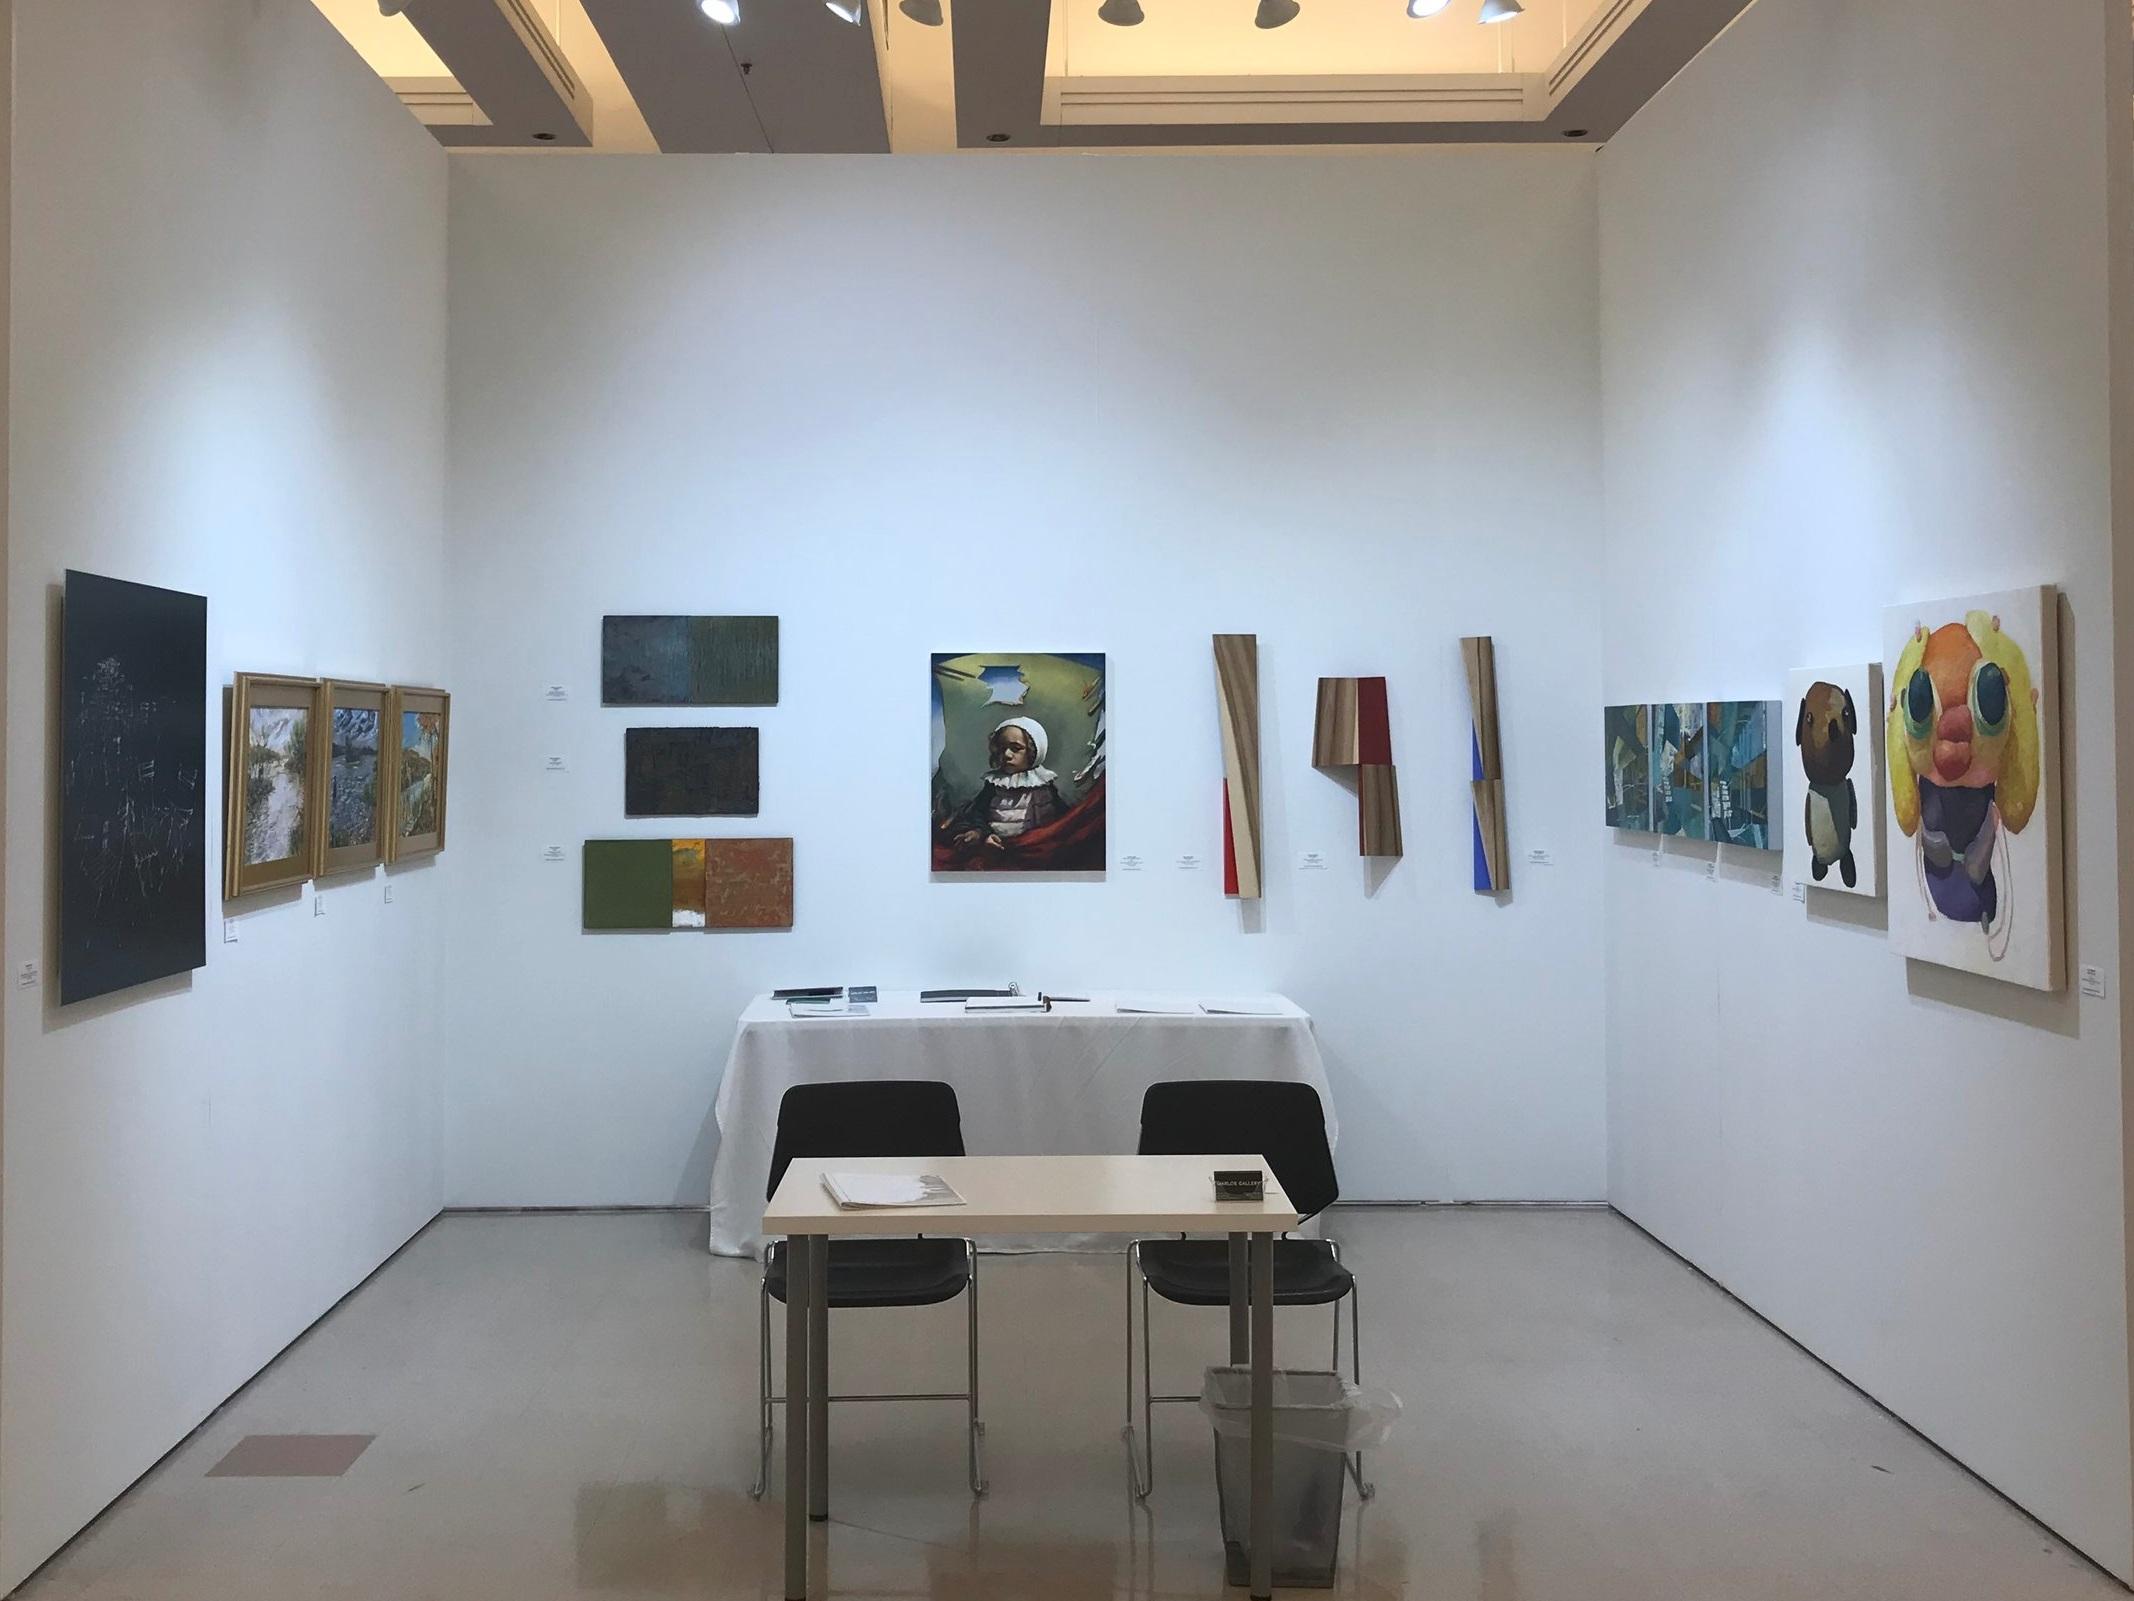 Reveal Contemporary Art Fair, Saratoga Springs, NY - Saratoga Springs City Center, Booth 207July 18 - 21, 2019